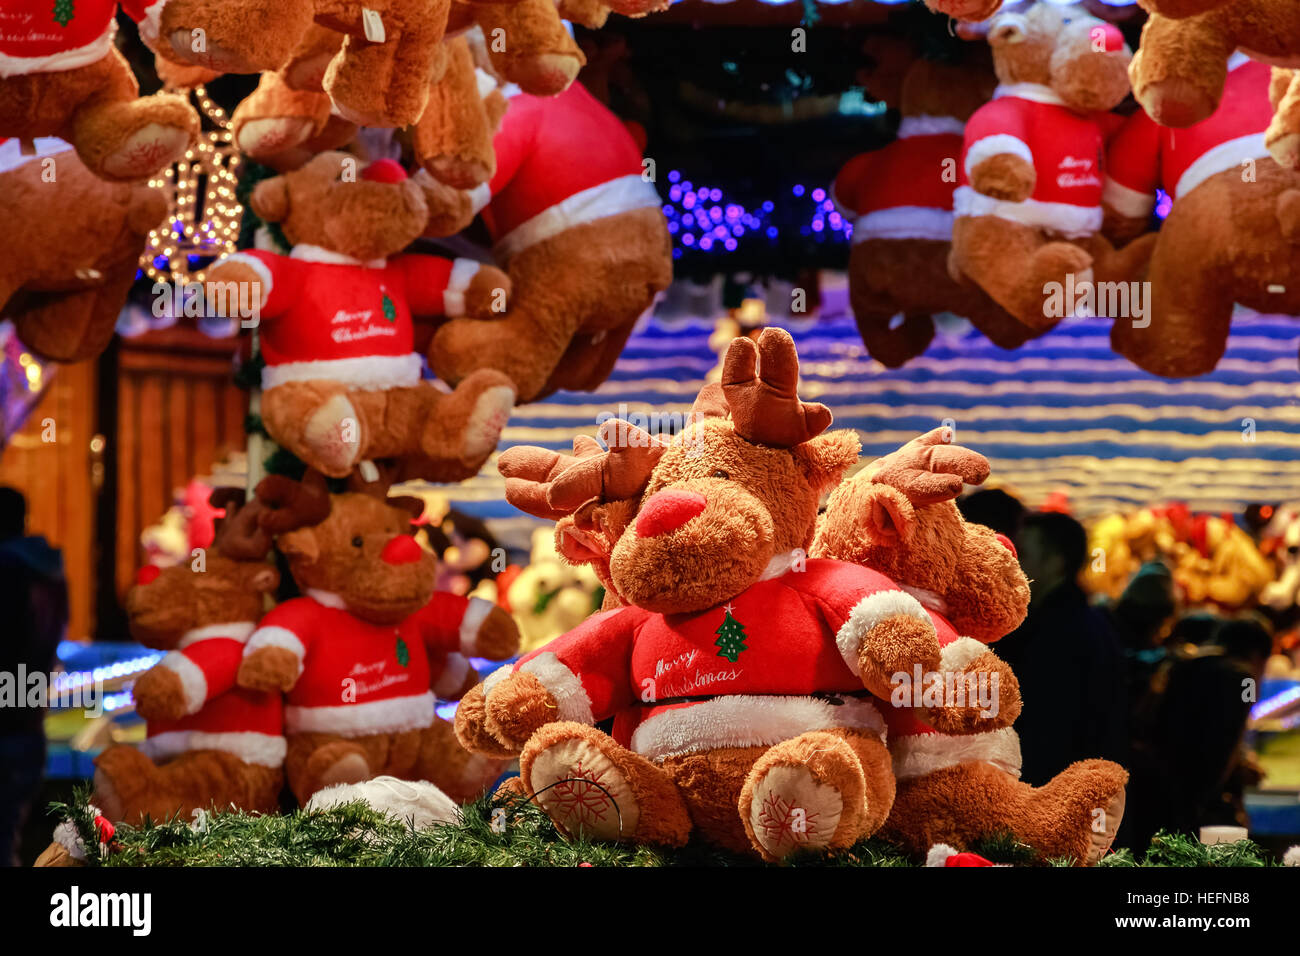 Rennes en peluche dans une foire de Noël, Winter Wonderland Photo Stock